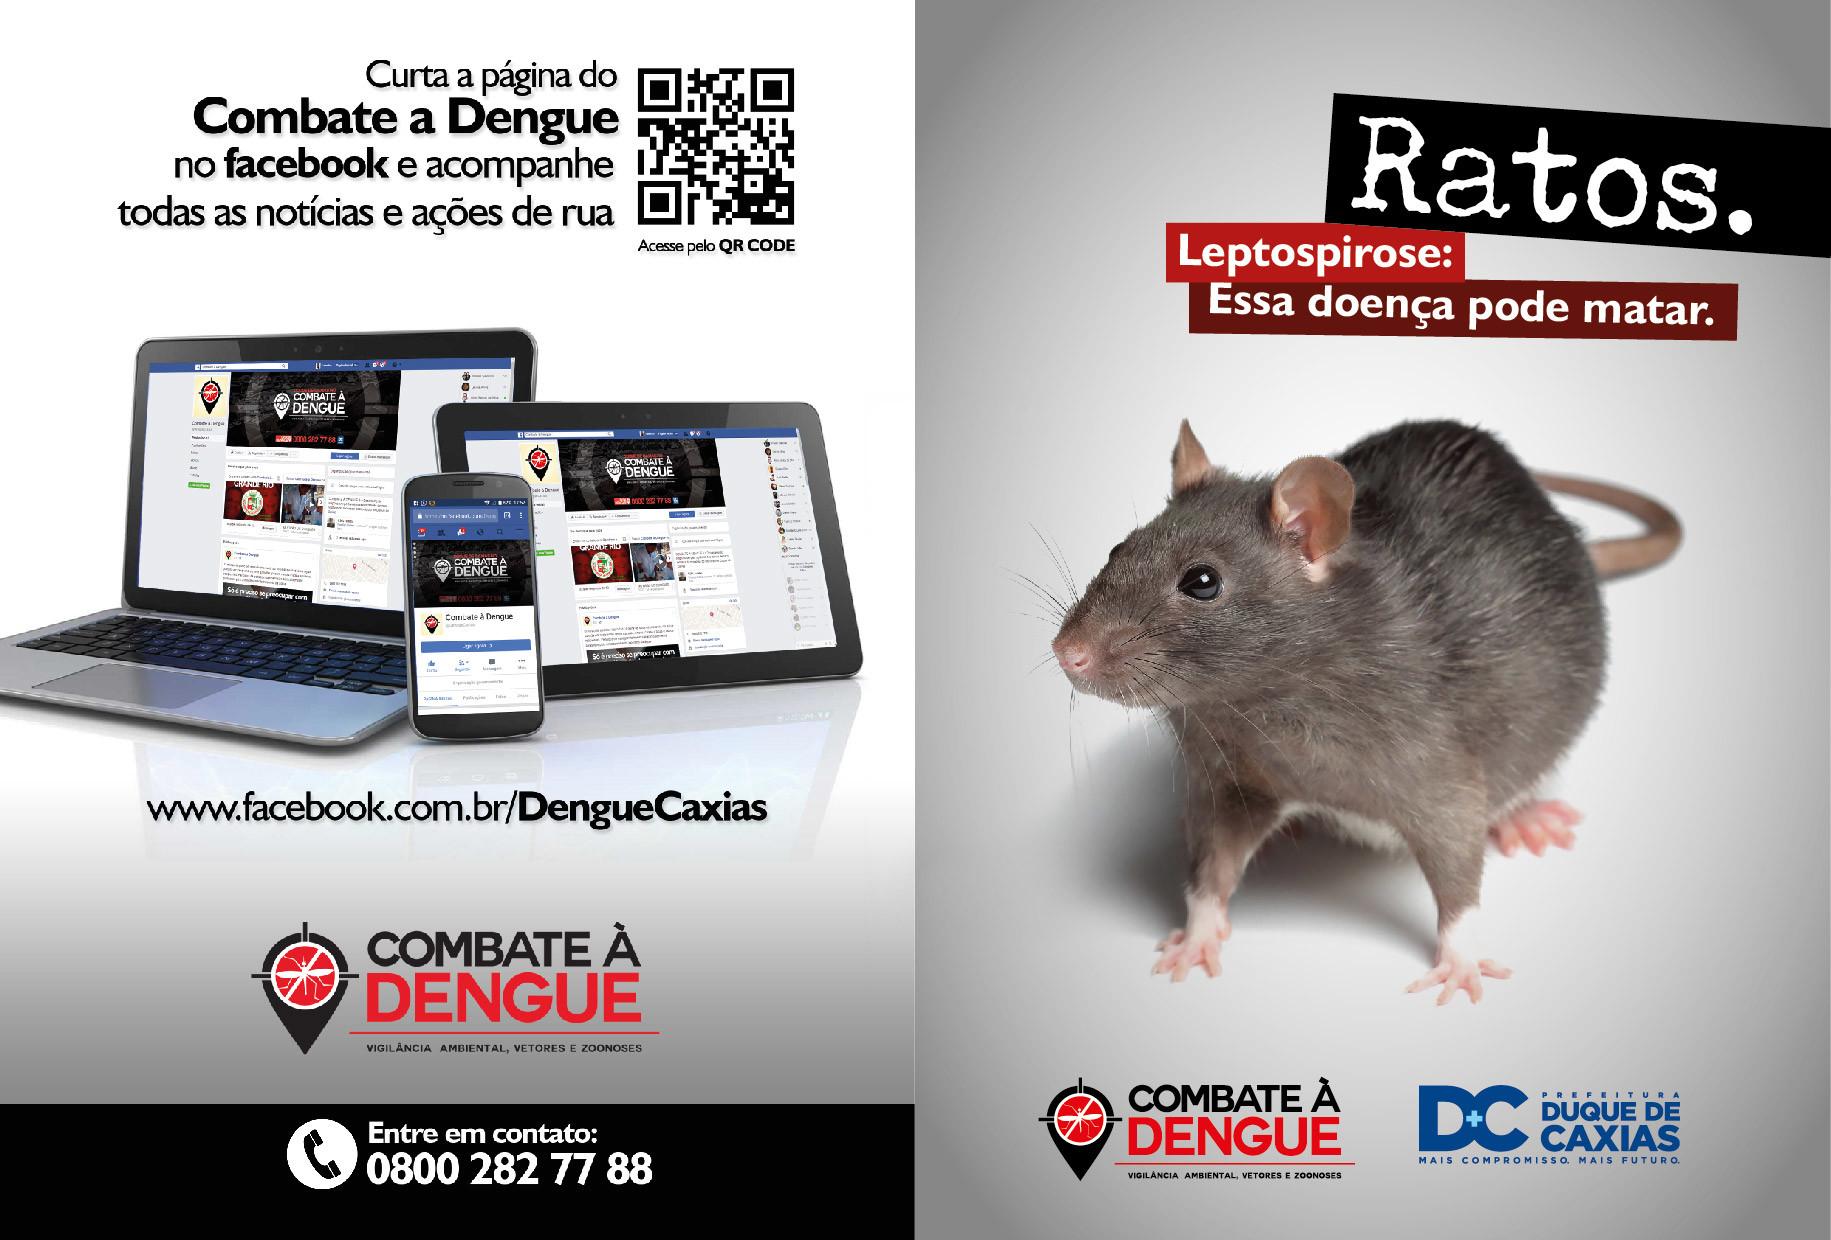 Leandro calazans folder rato 06